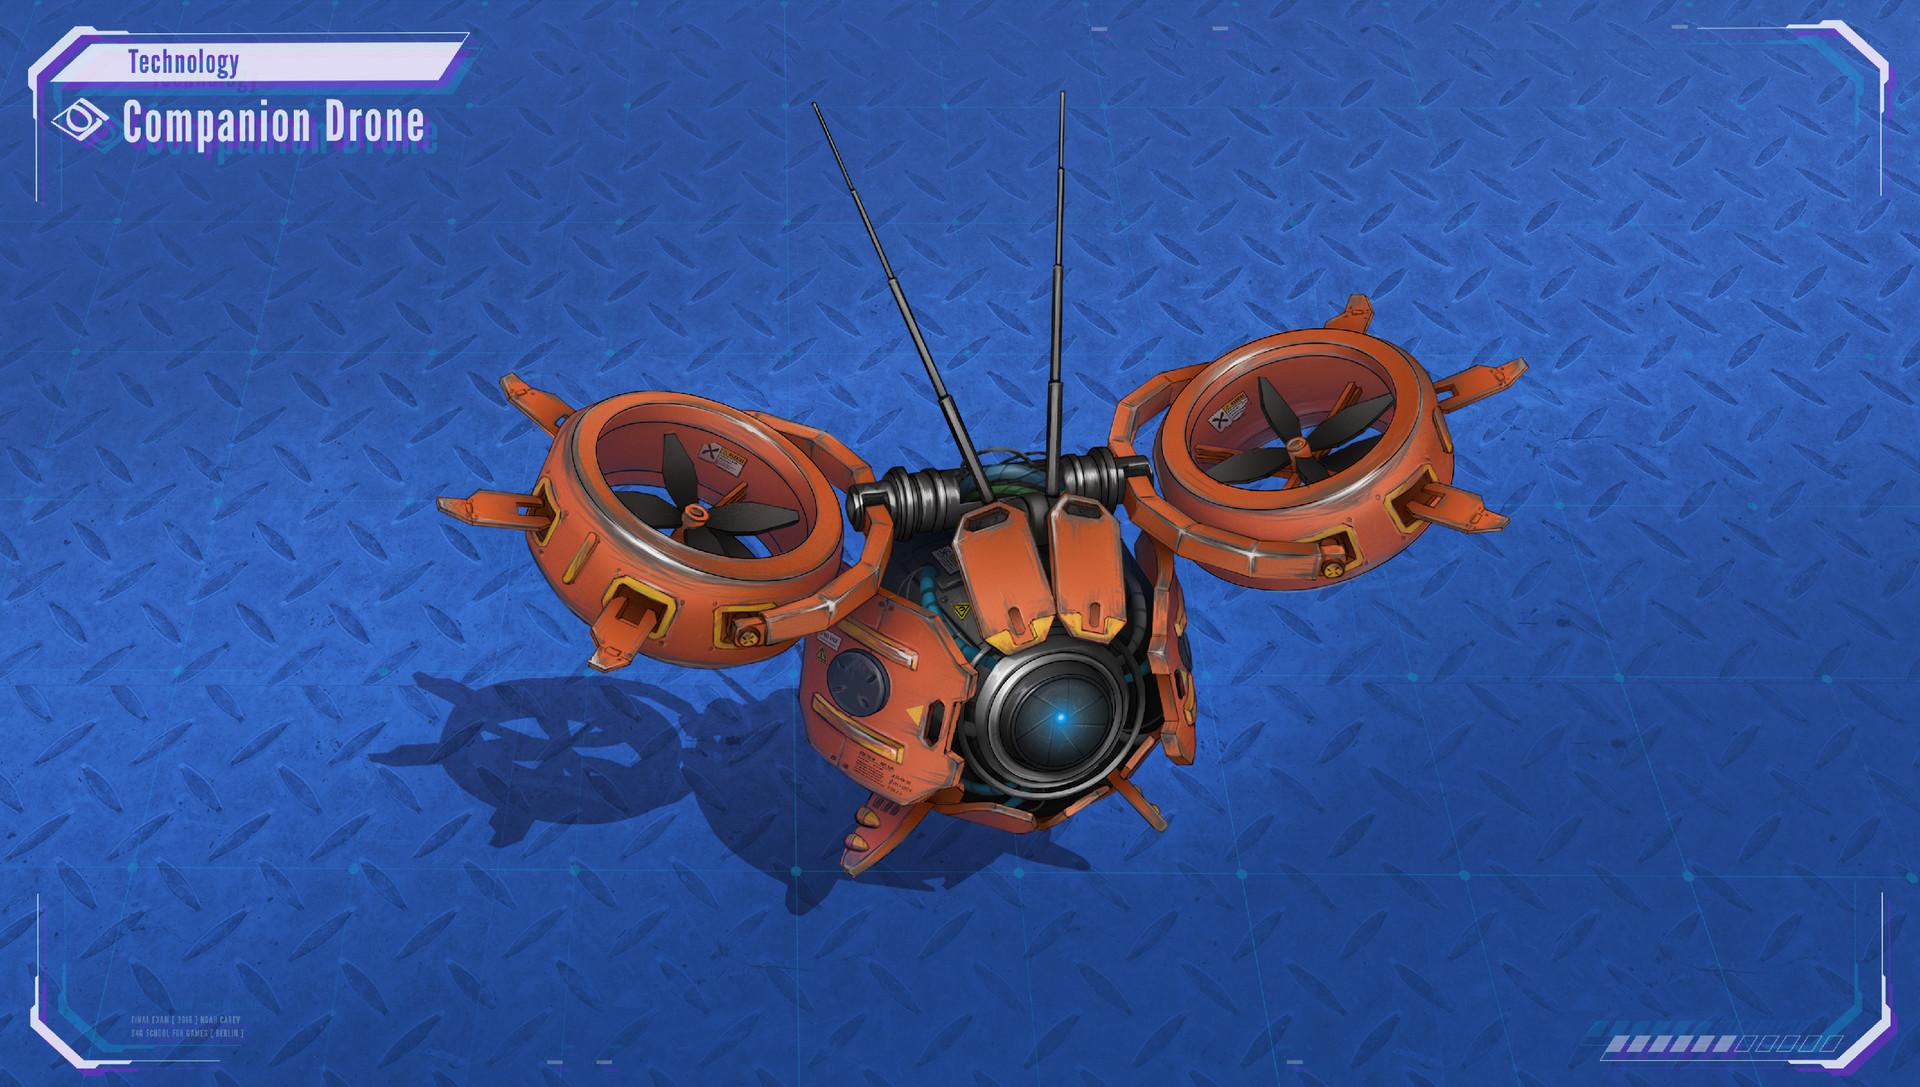 Noah carev 06 branding drone 01